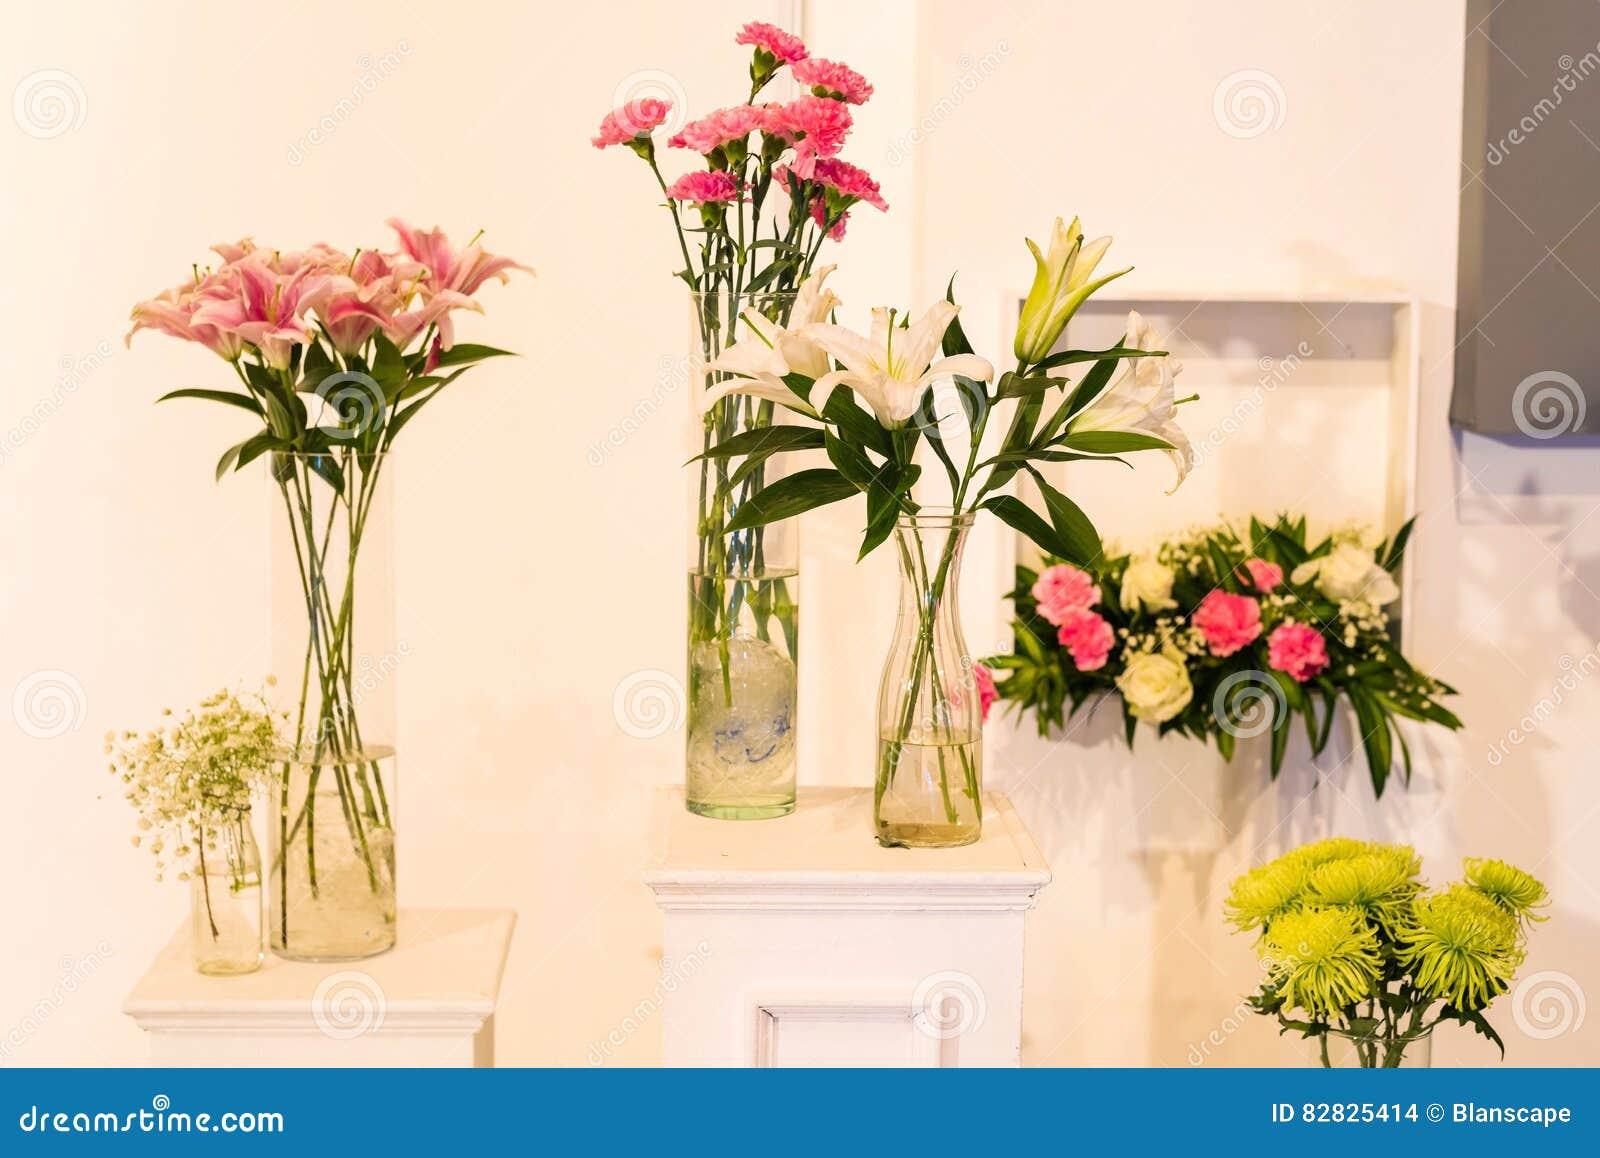 Flower in glass pot for wedding interior stock photo image of flower in glass pot for wedding interior izmirmasajfo